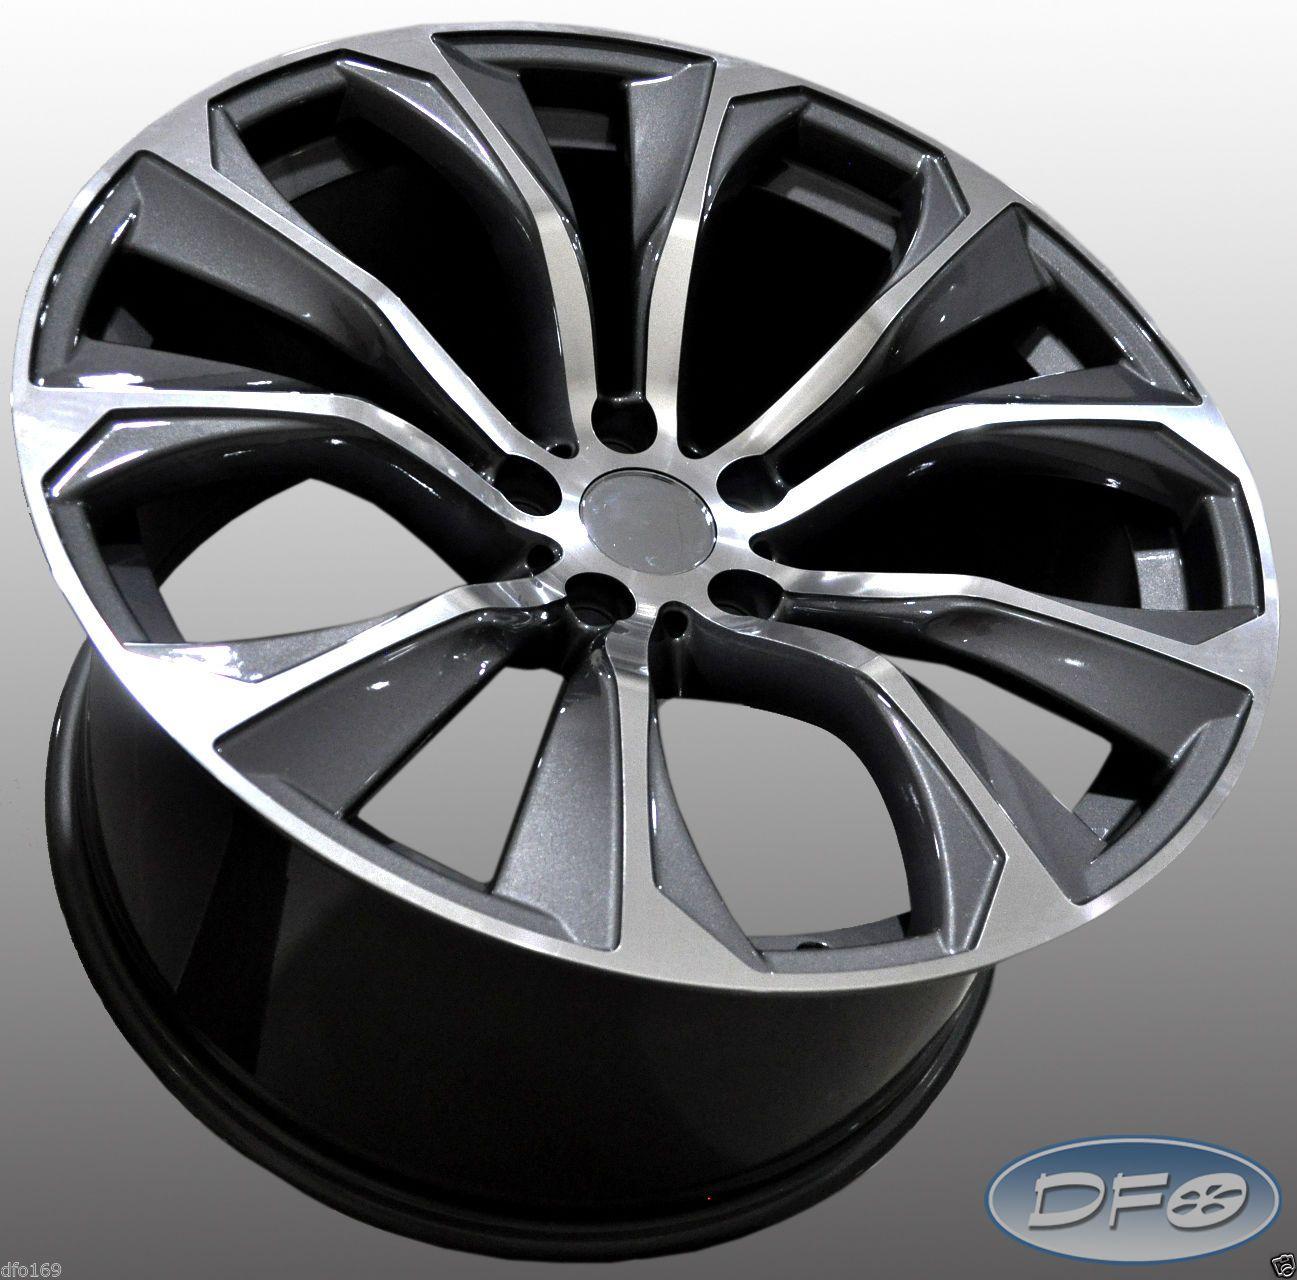 "Bmw X6 Wheels: 21"" 2015 X6 M Style Staggered Alloy Wheels Fits BMW X5 X6"